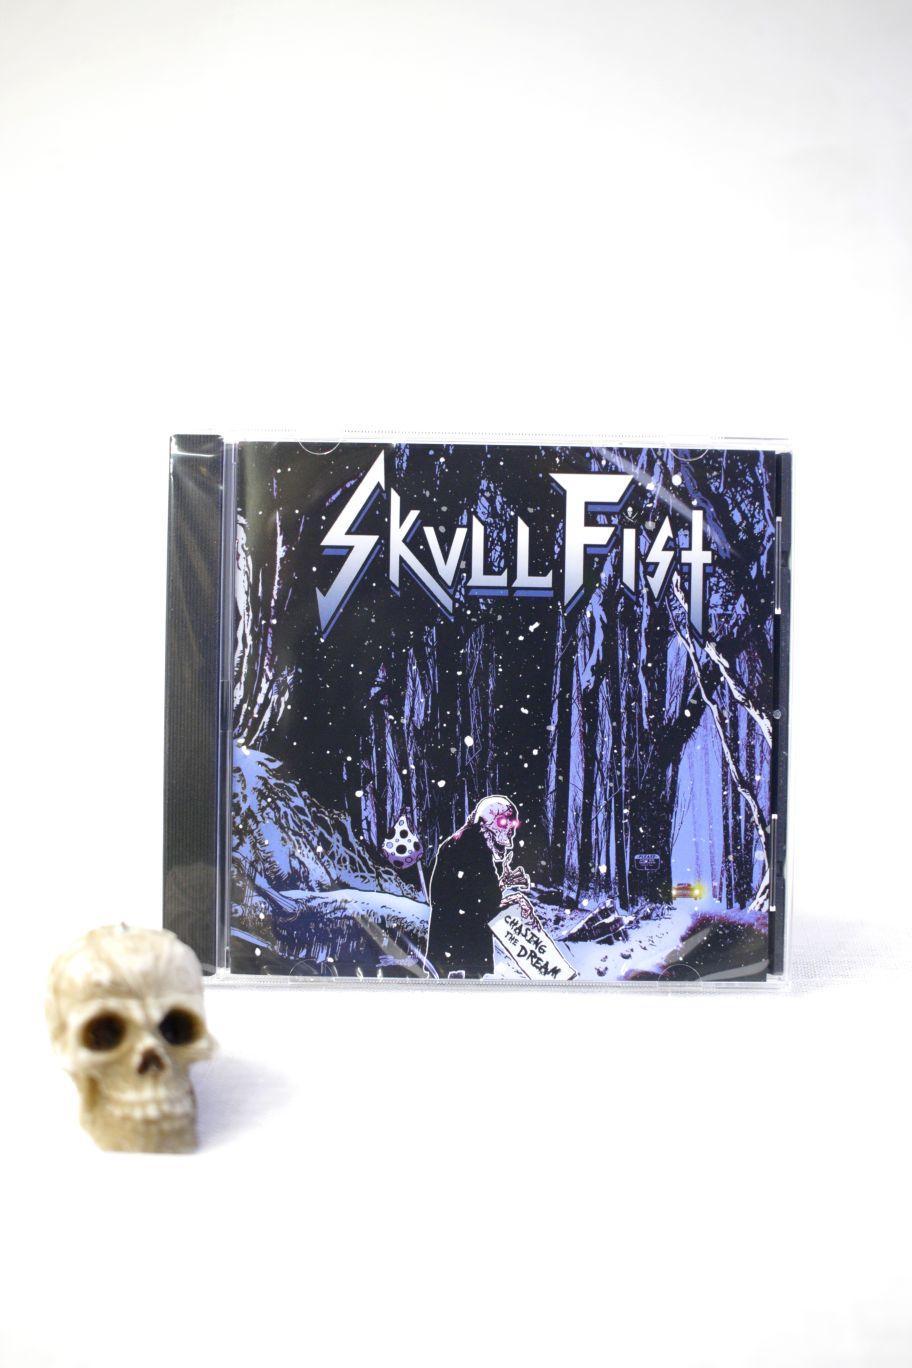 CD SKULL FIST CHASING THE DREAM